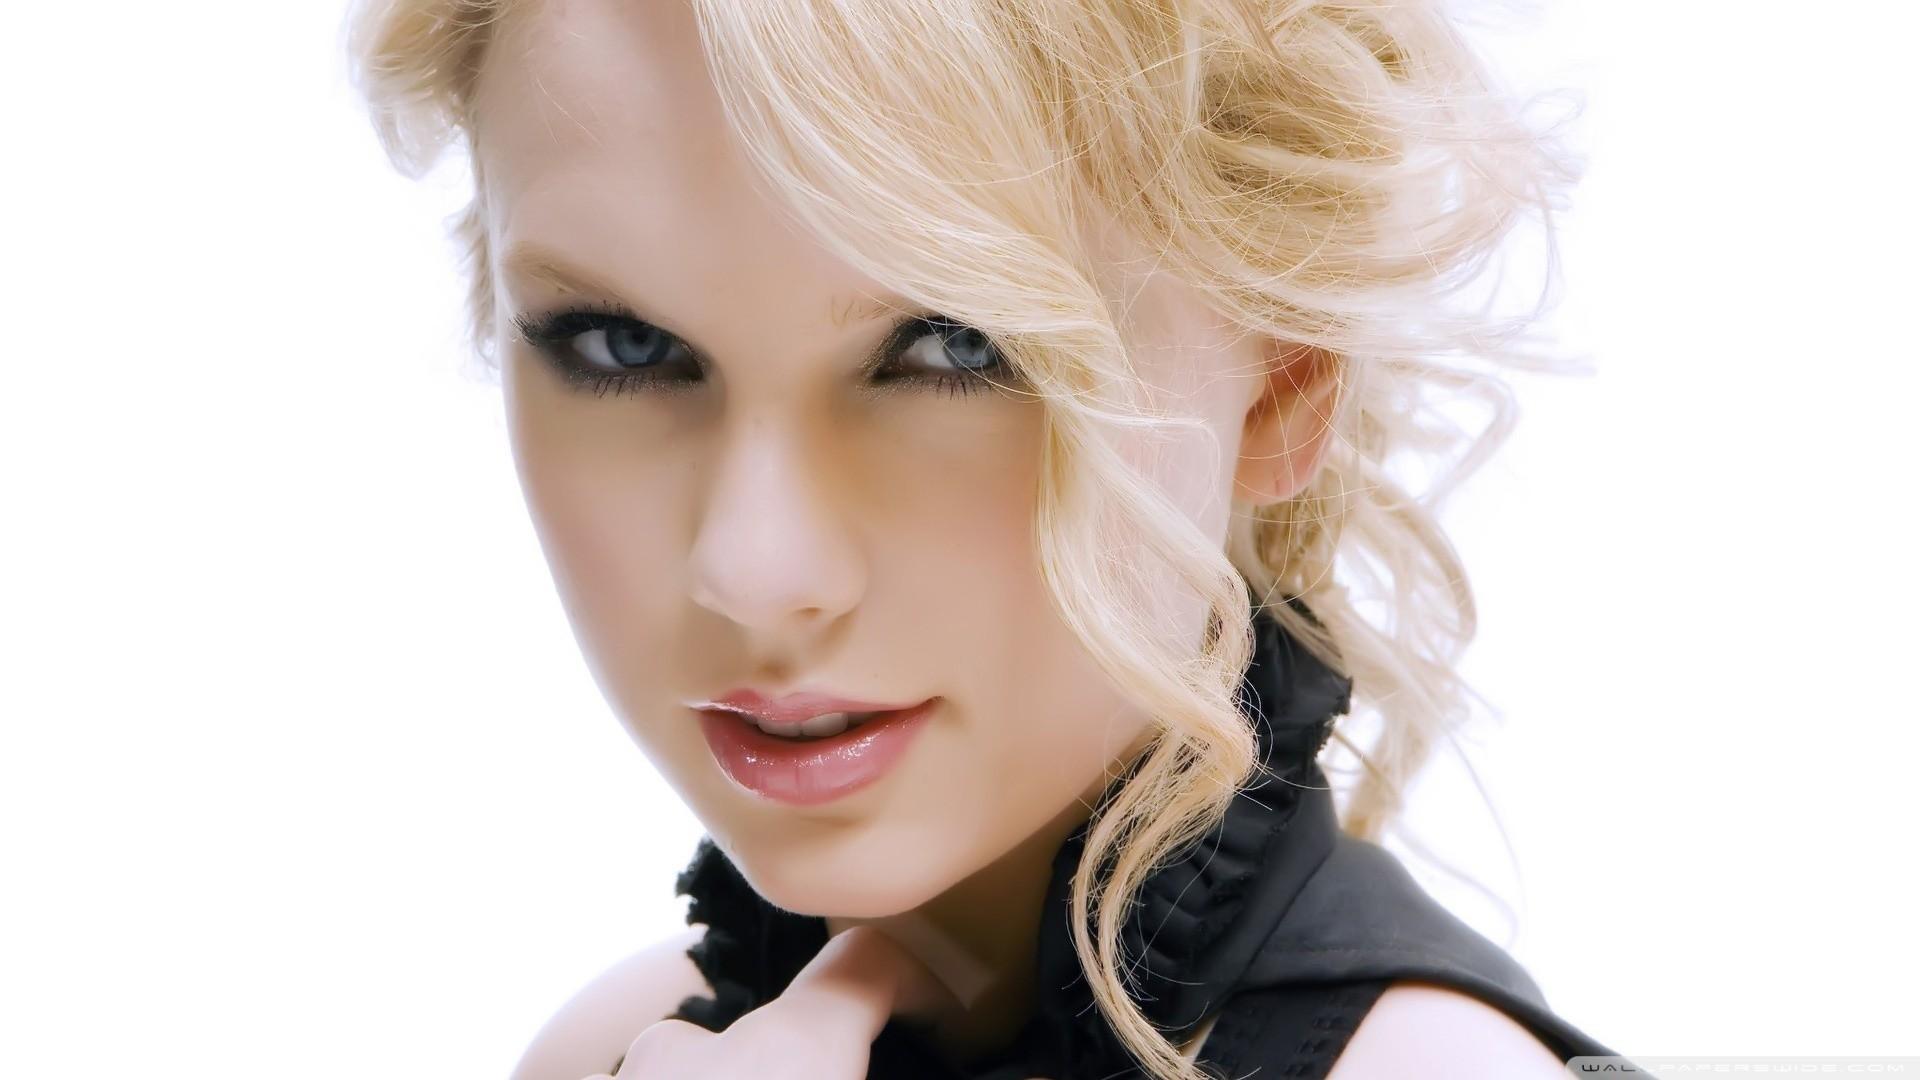 Taylor swift blonde hair